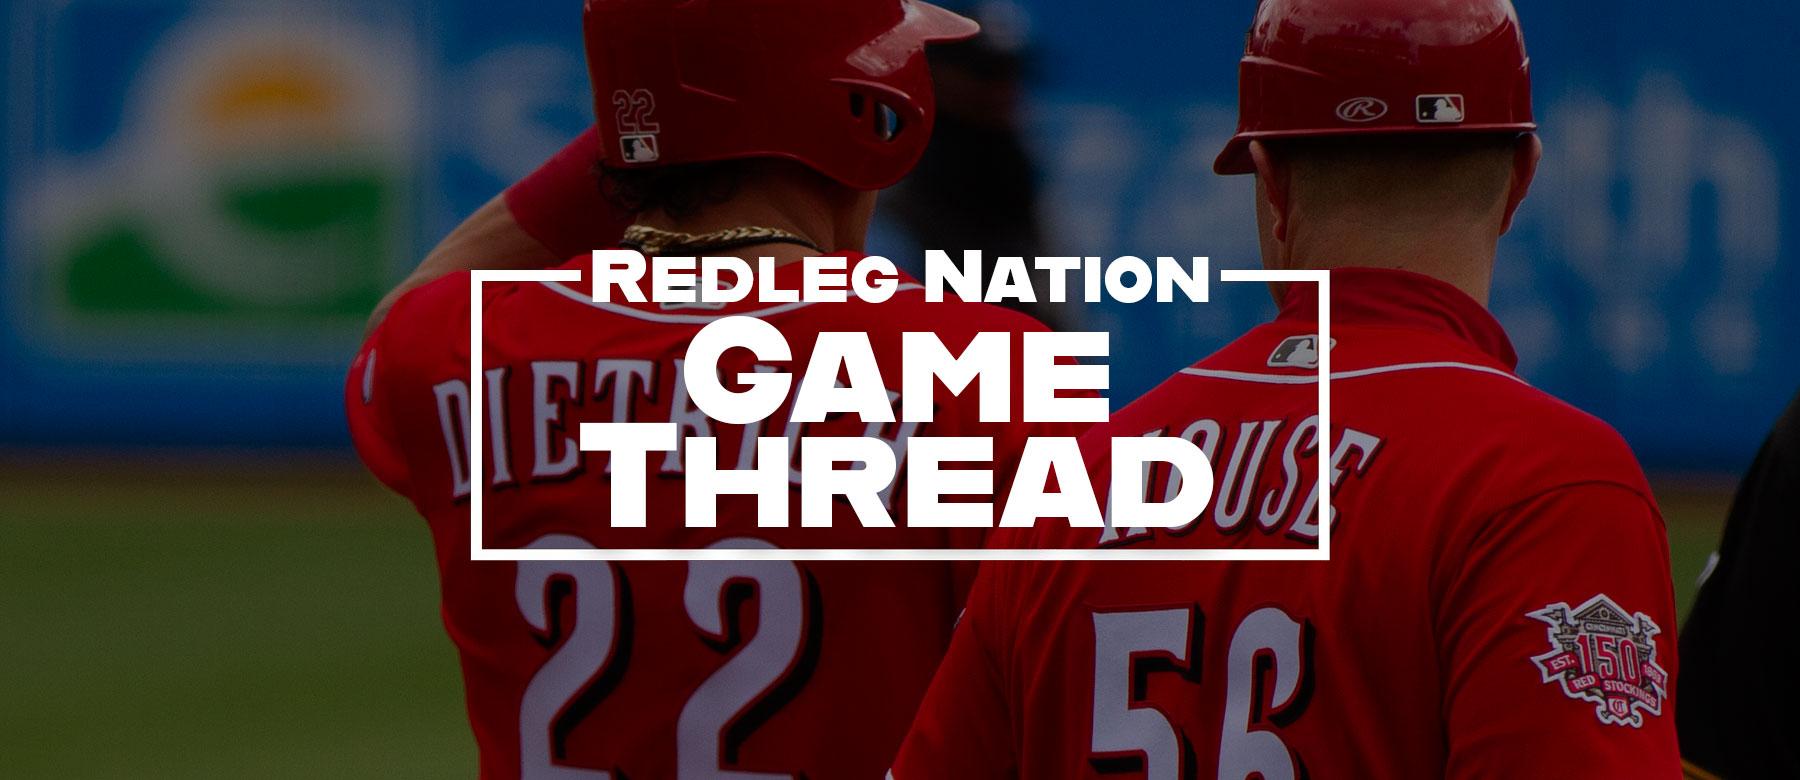 Reds vs. Rockies – July 13, 2019 - Redleg Nation